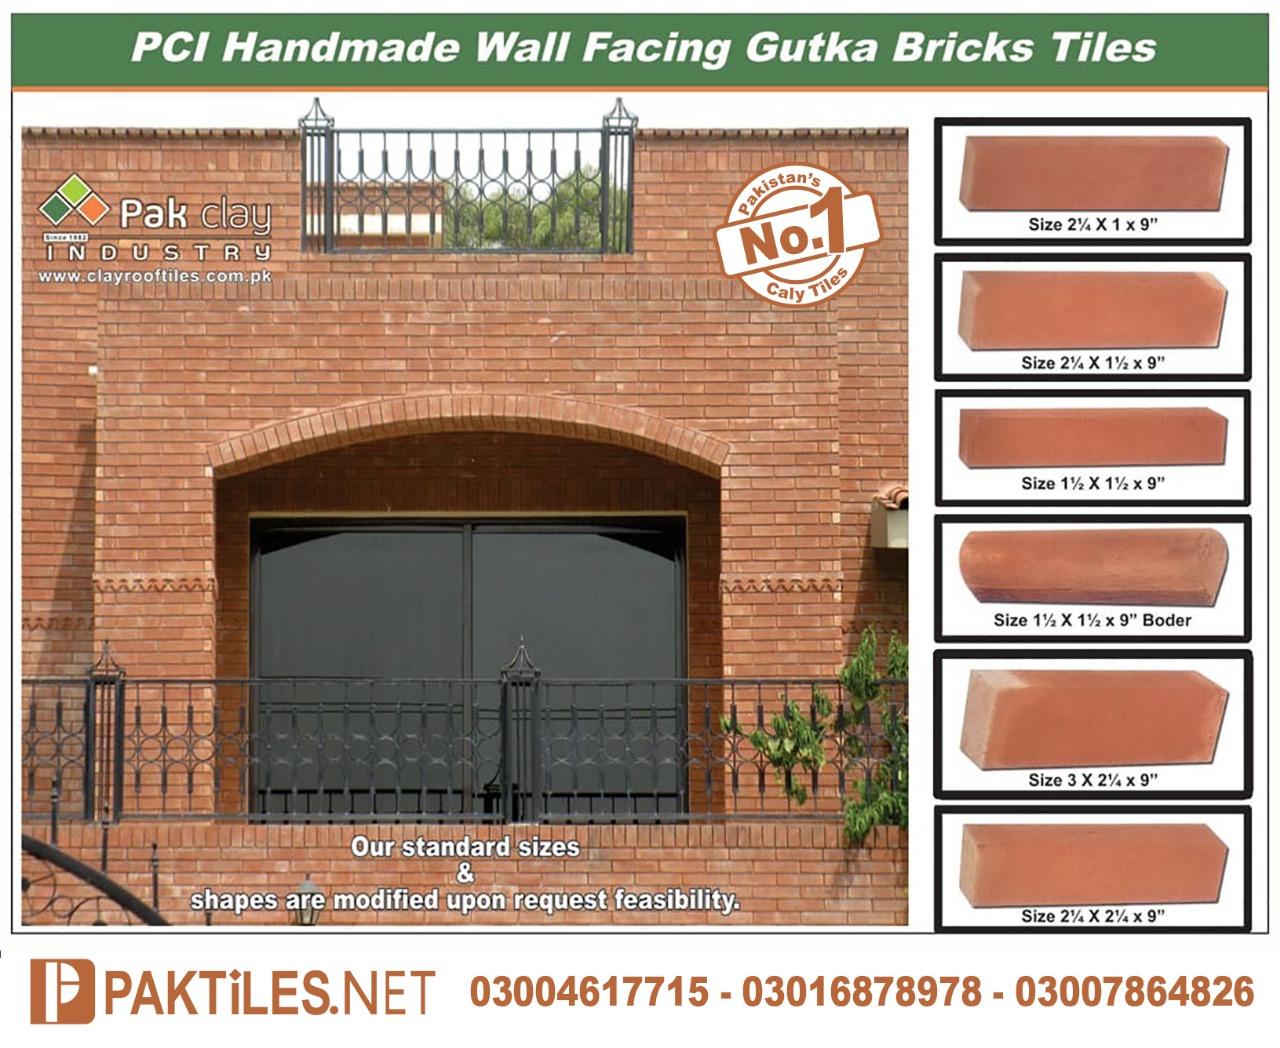 Red Gutka Bricks Size Brick Wall Tiles in Pakistan